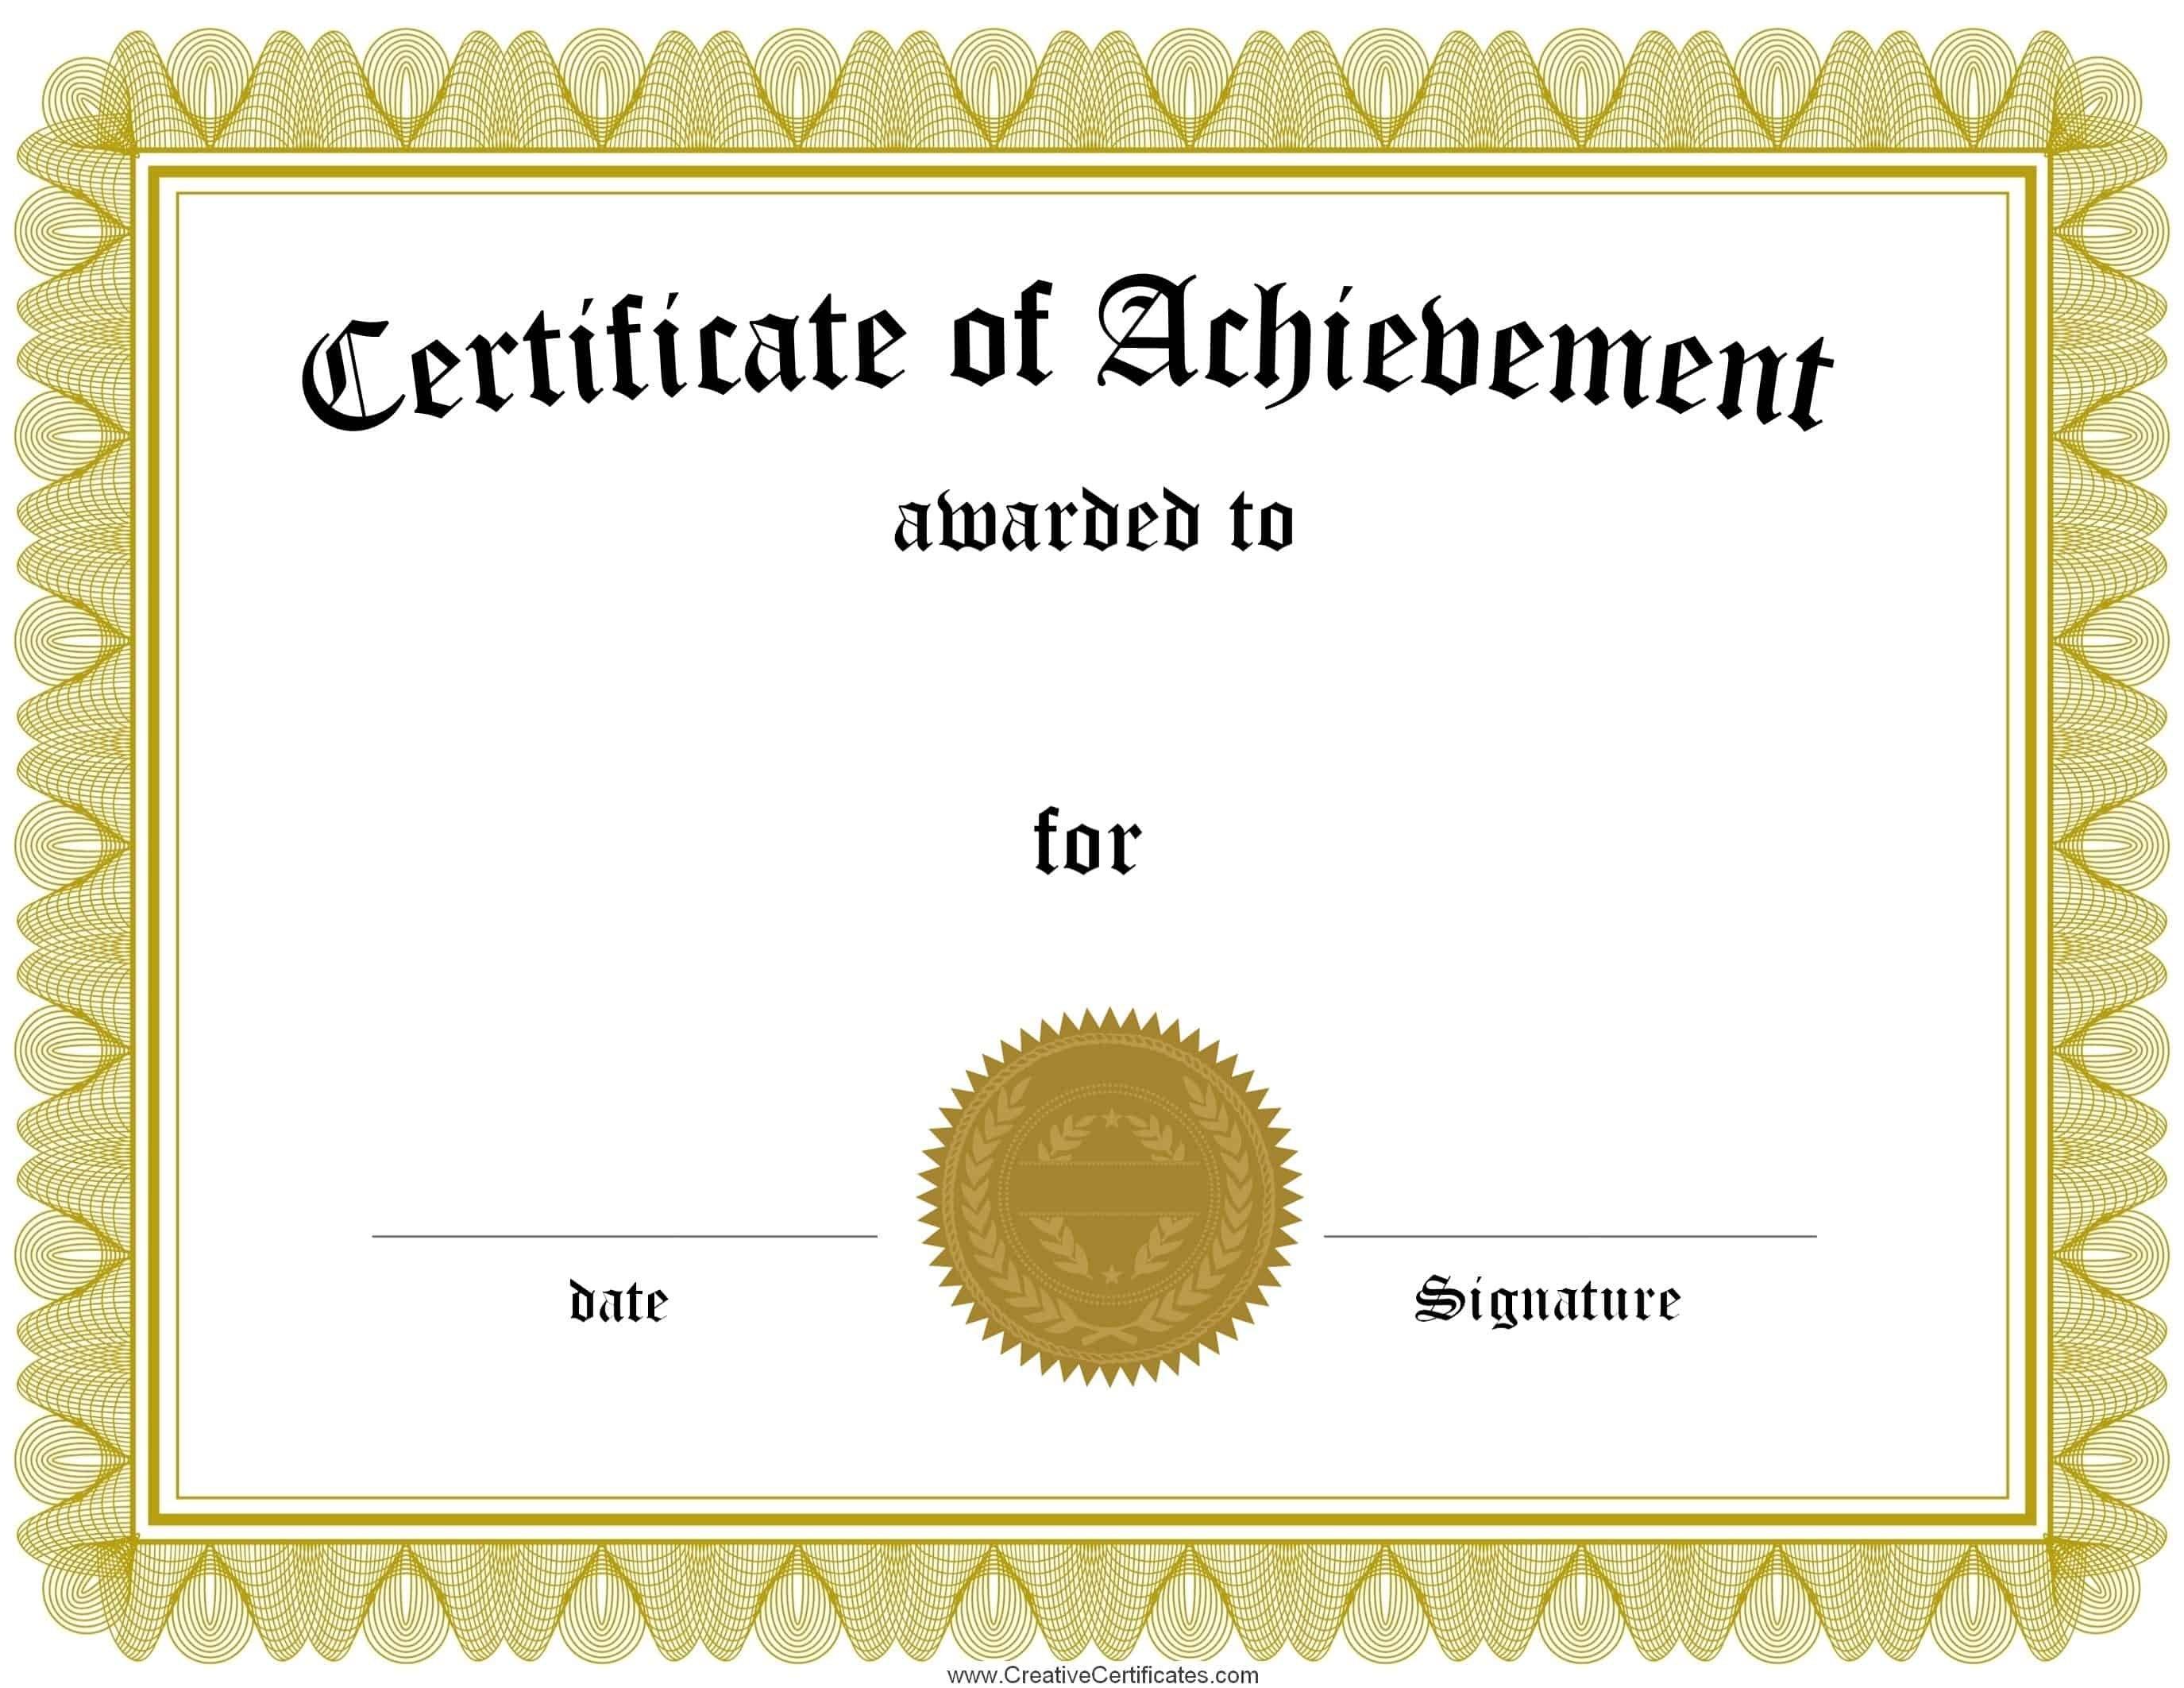 Free Customizable Certificate Of Achievement Regarding Certificate Of Attainment Template